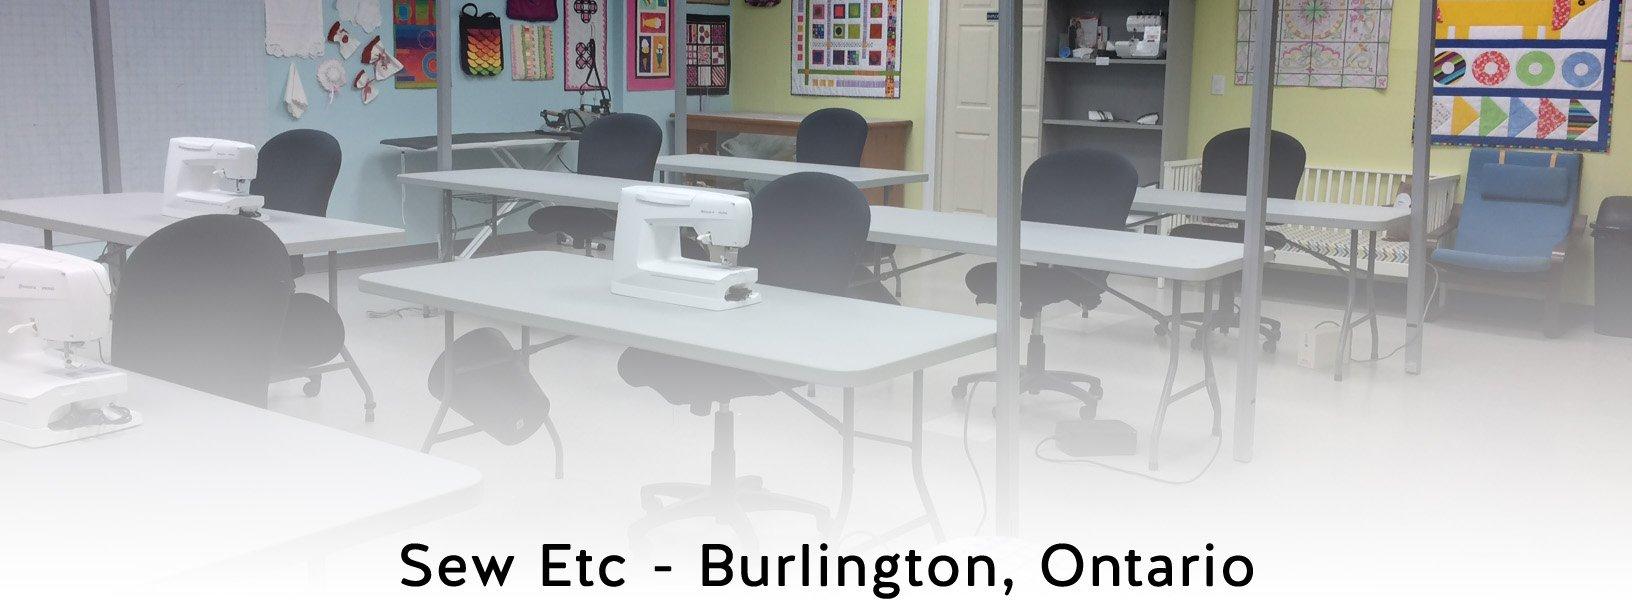 SewEtc Classroom